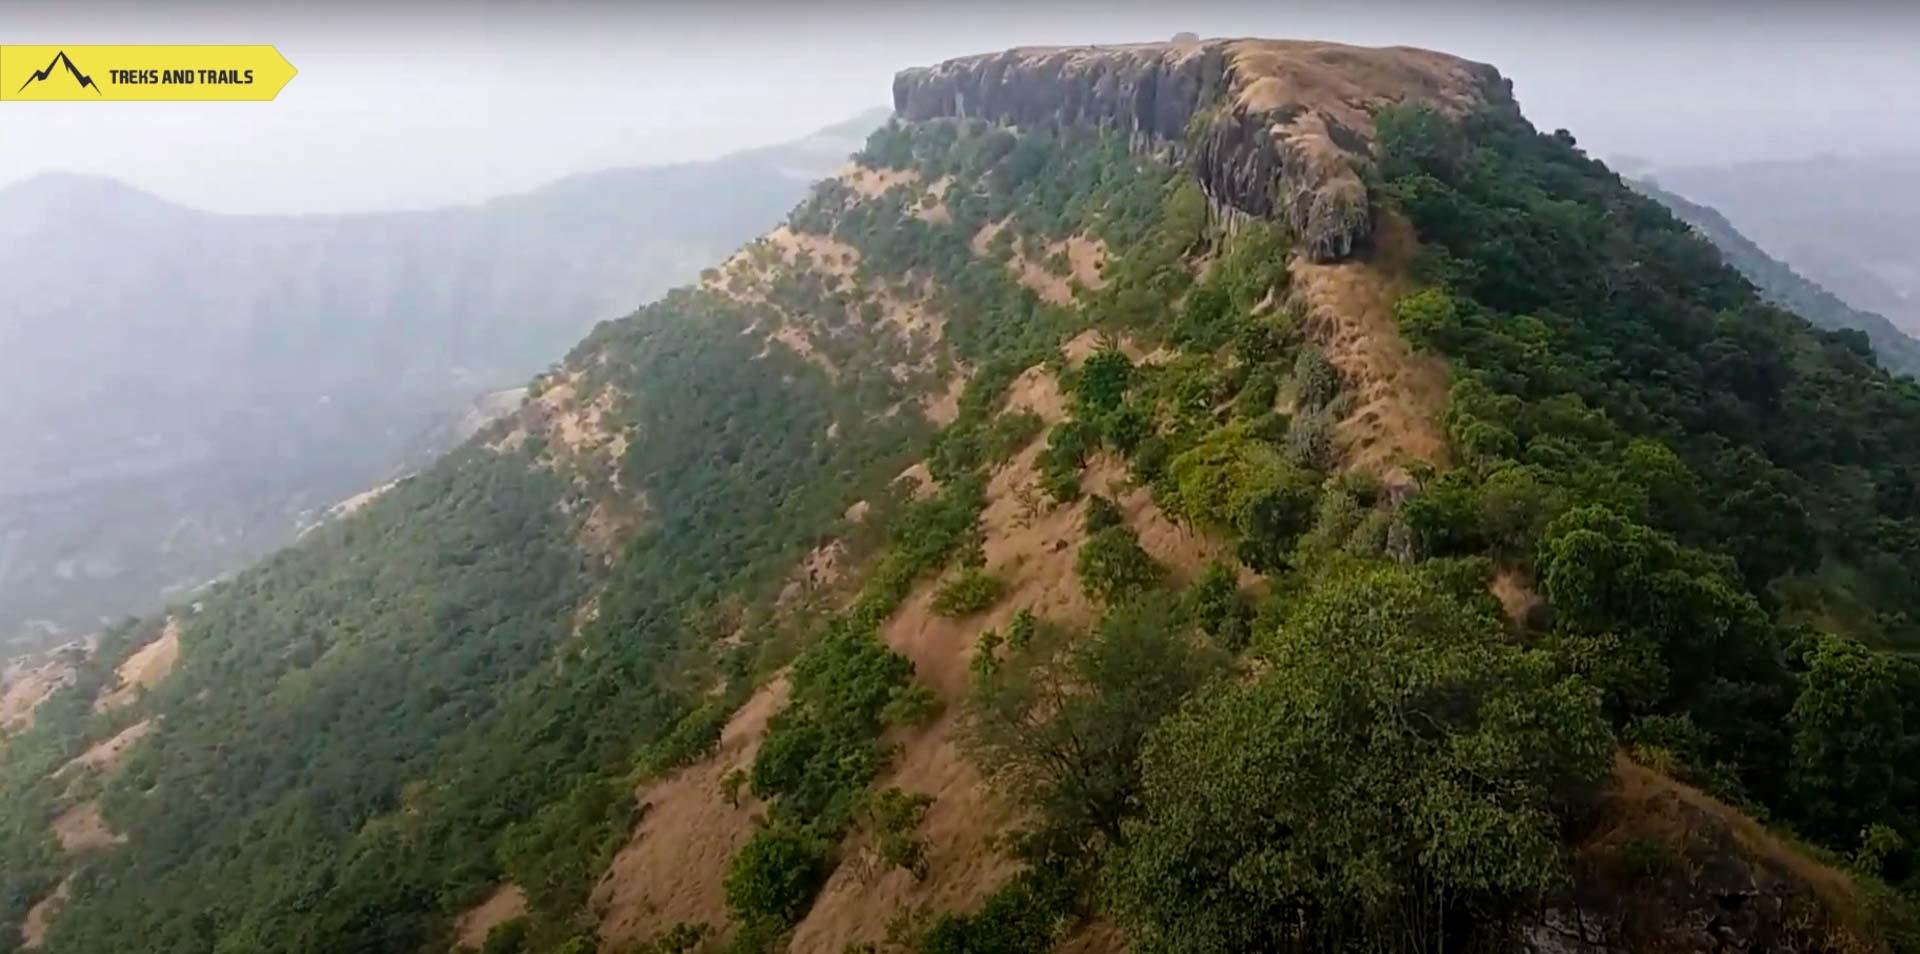 Vairatgad Fort